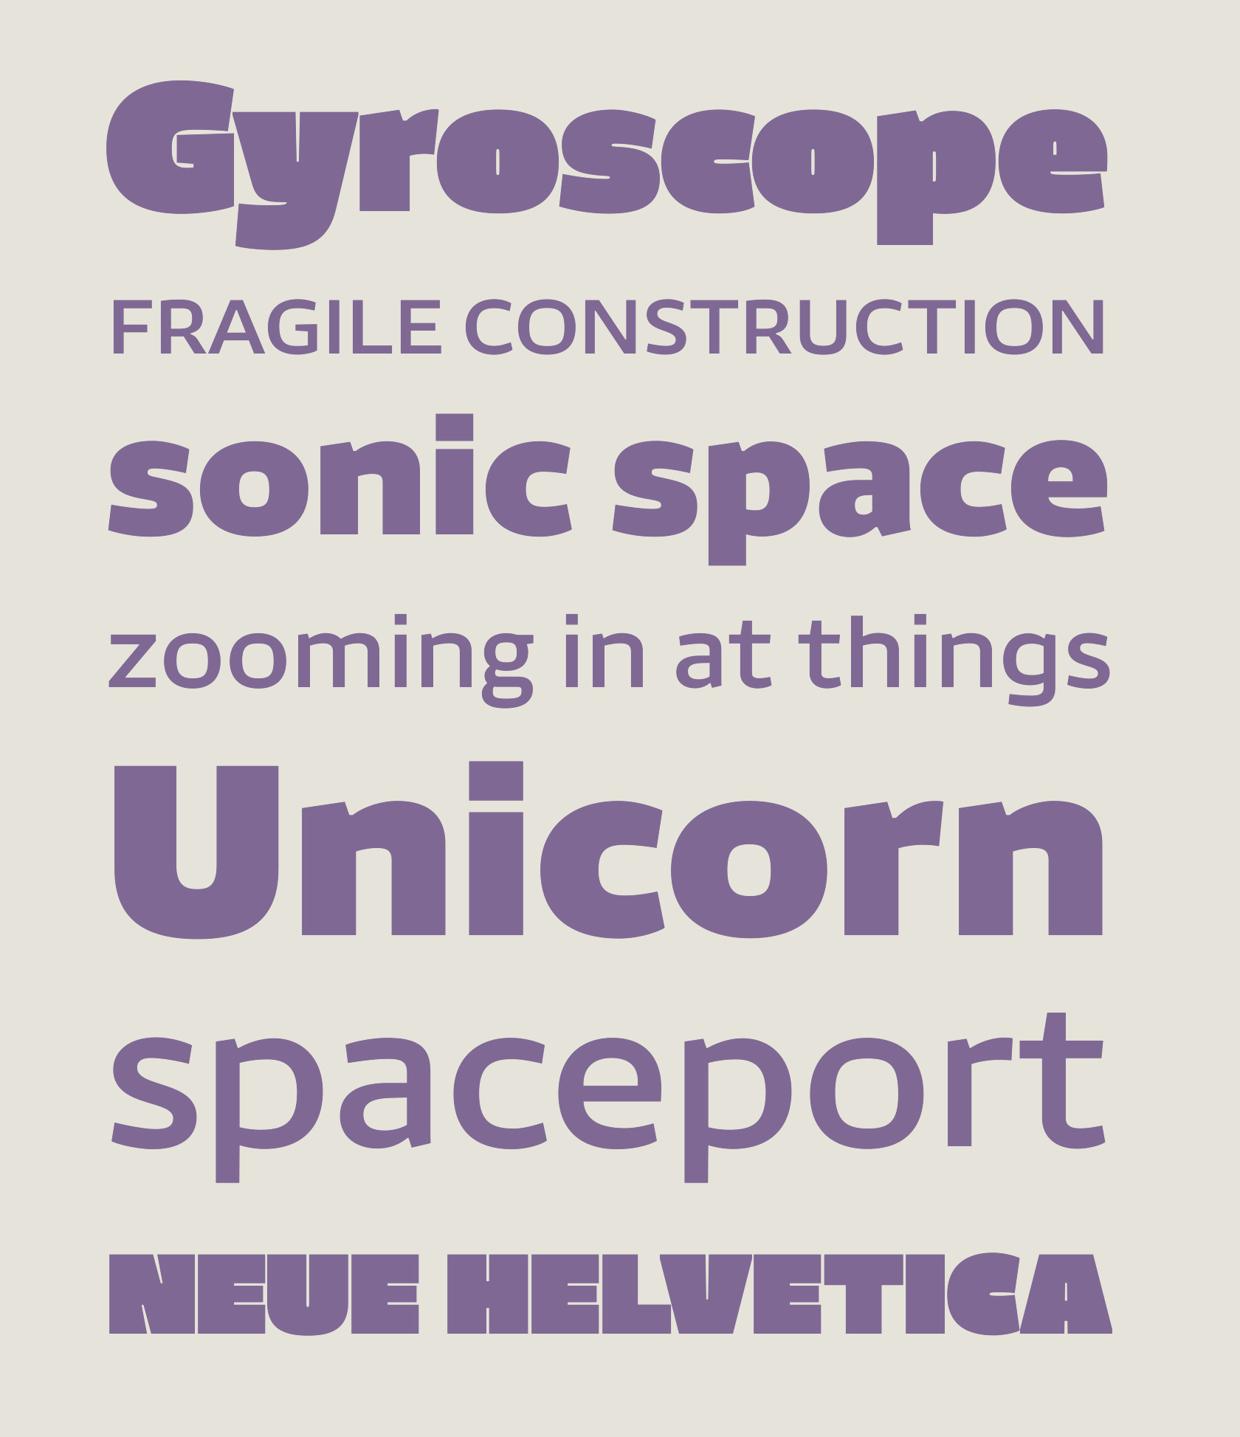 Futon typeface